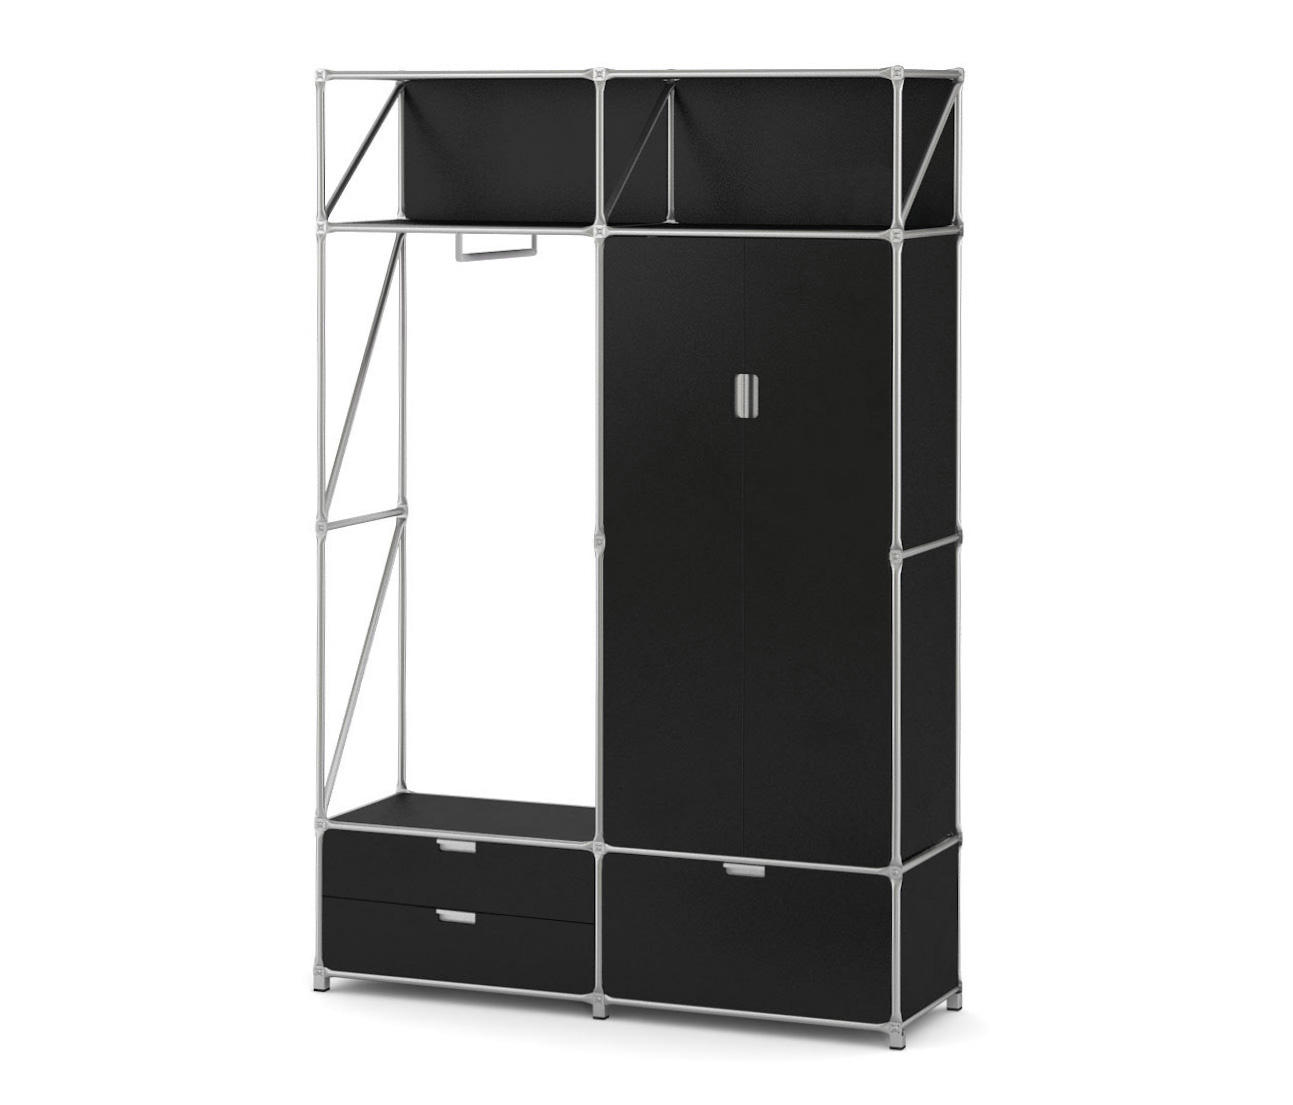 gaderobe schwarz guardarropas de system 180 architonic. Black Bedroom Furniture Sets. Home Design Ideas